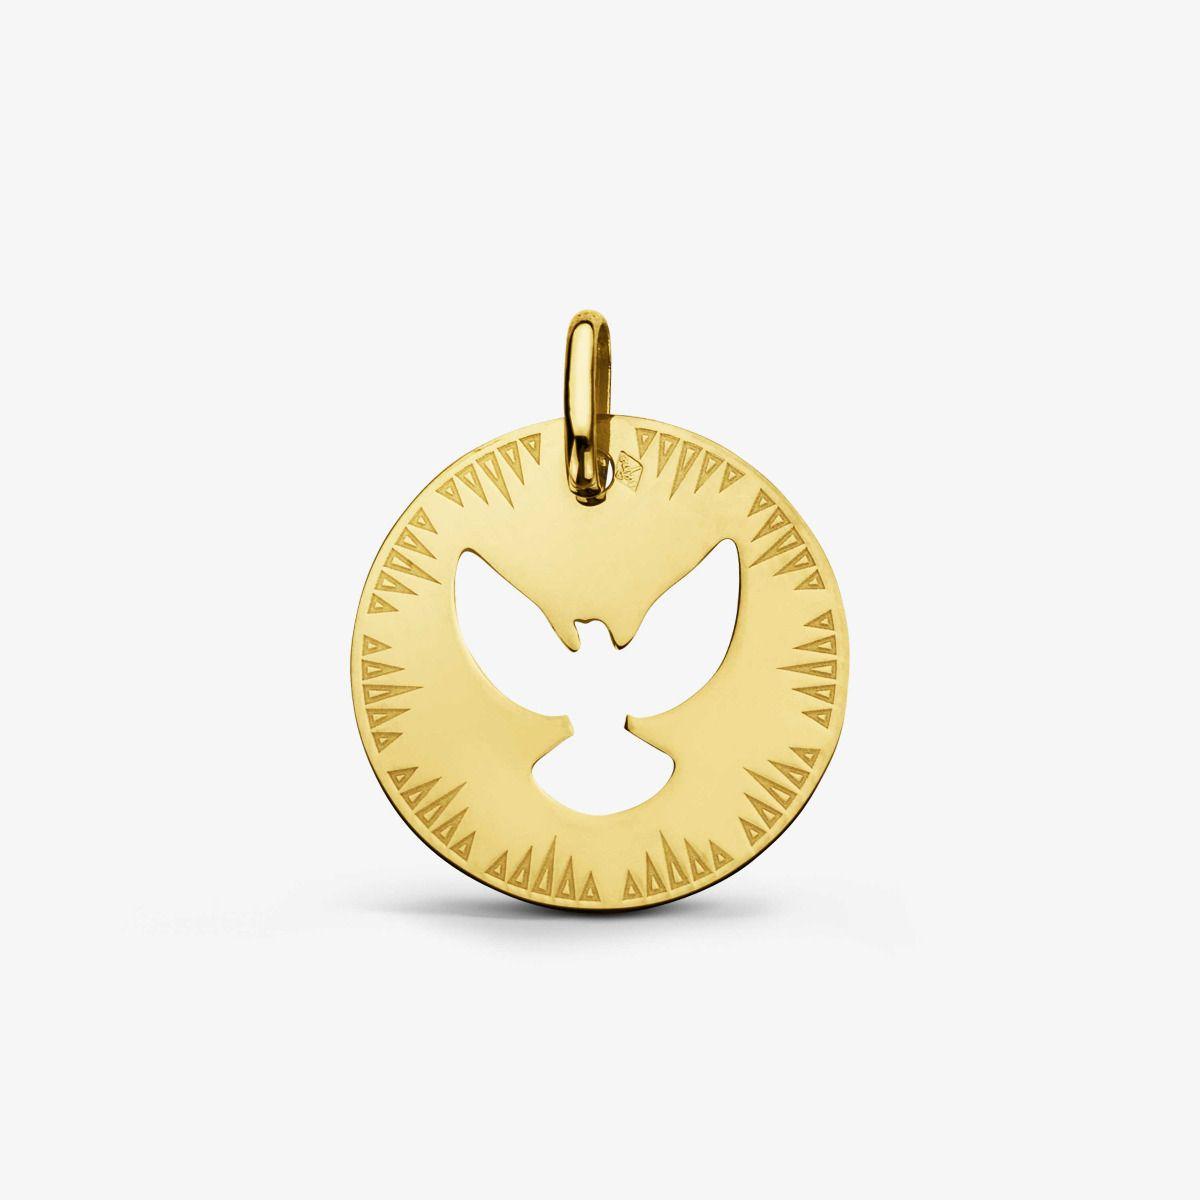 Médaille Colombe ajourée Or Jaune 18 carats - 18 mm